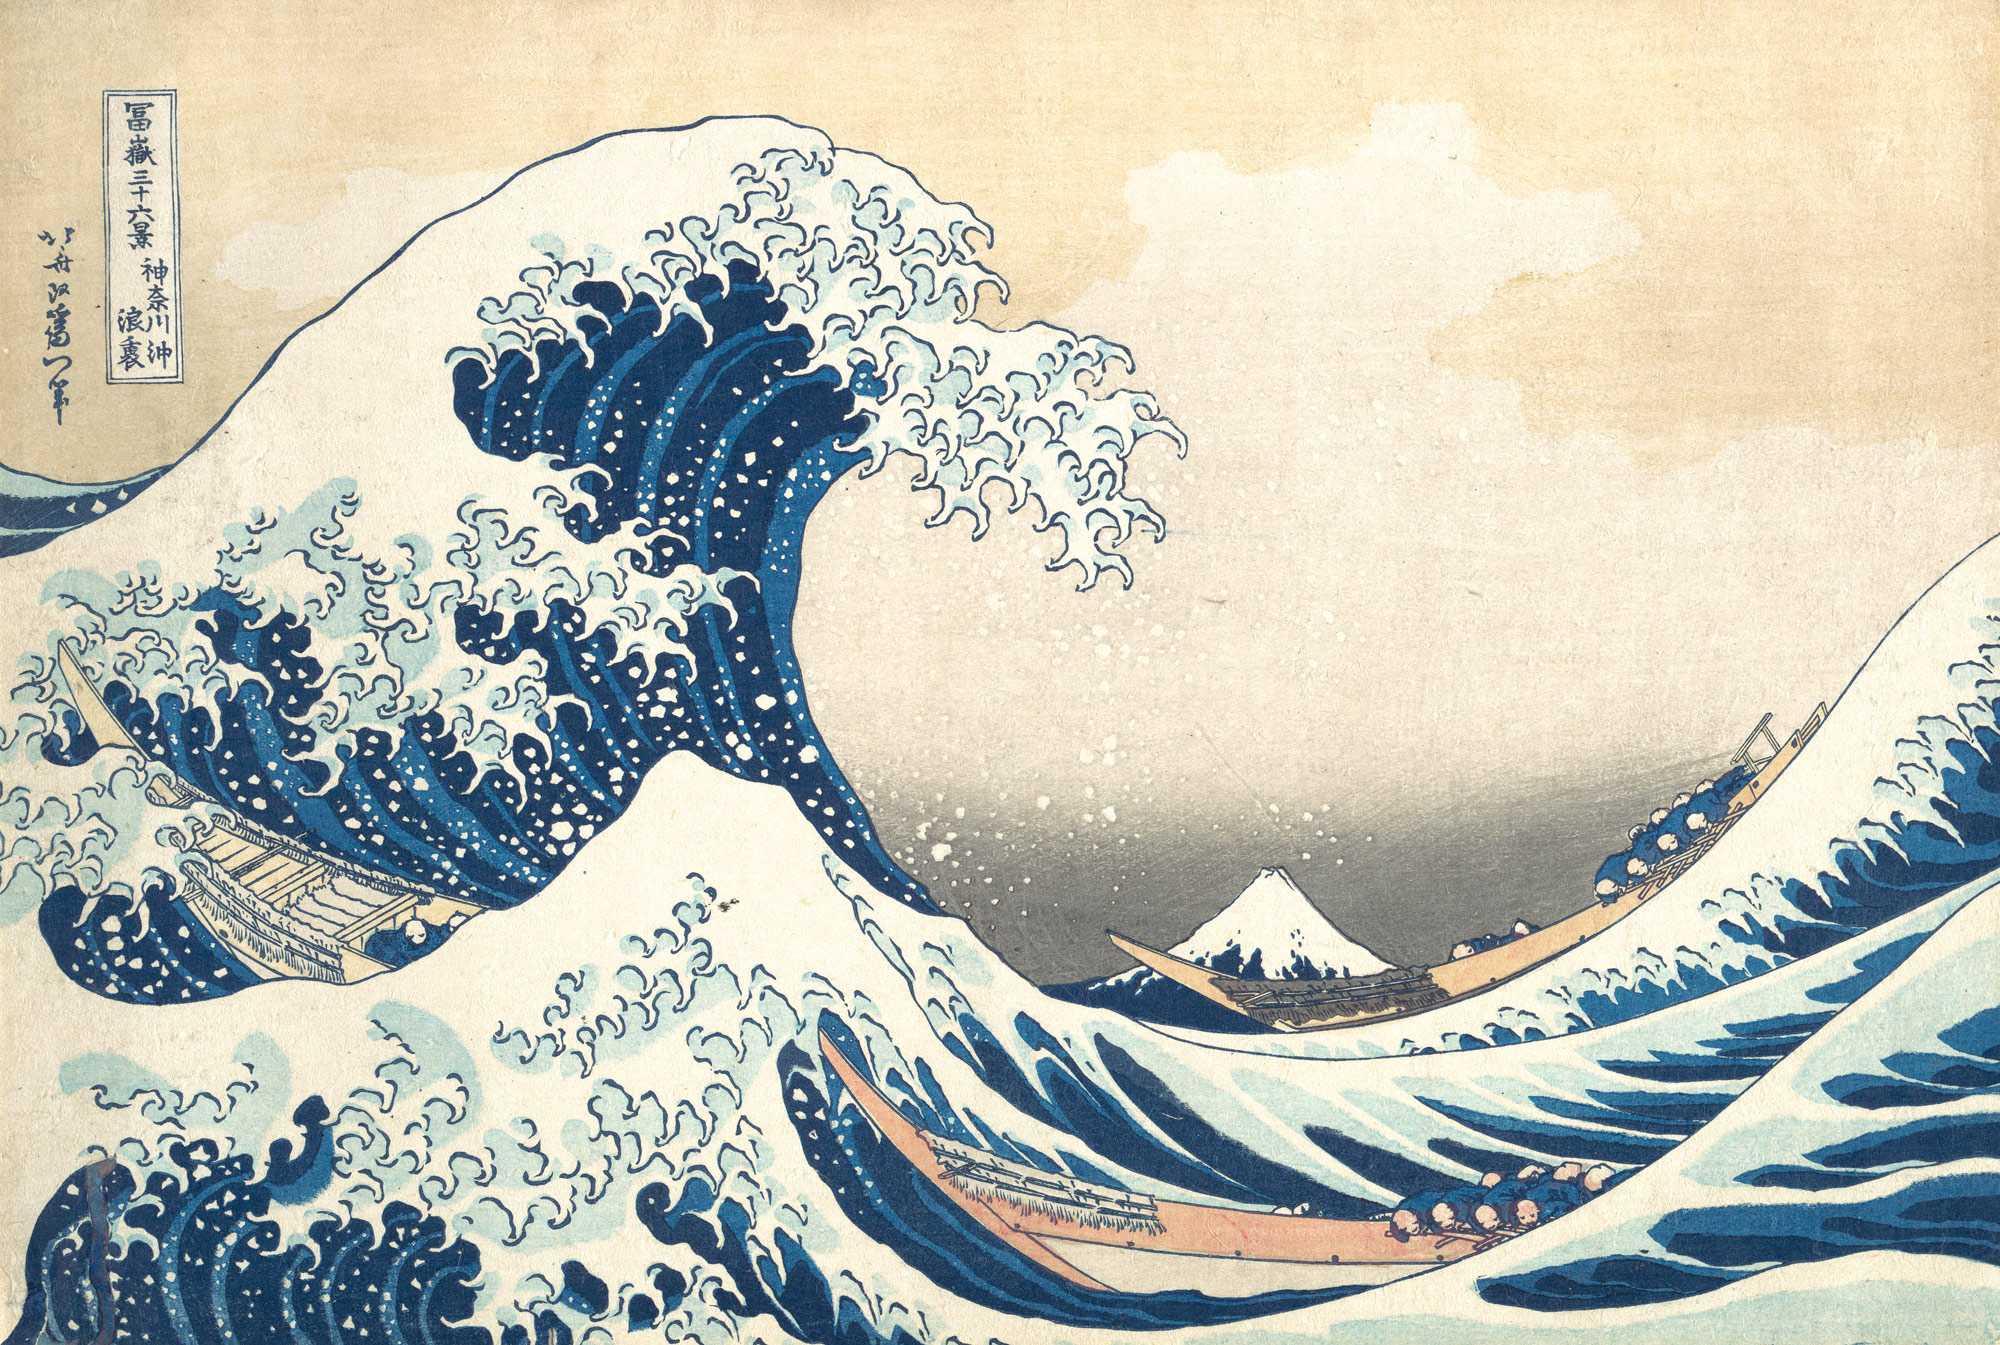 """The Great Wave off Kanagawa"" by Katsushika Hokusai. Photo by The Metropolitan Museum of Art"